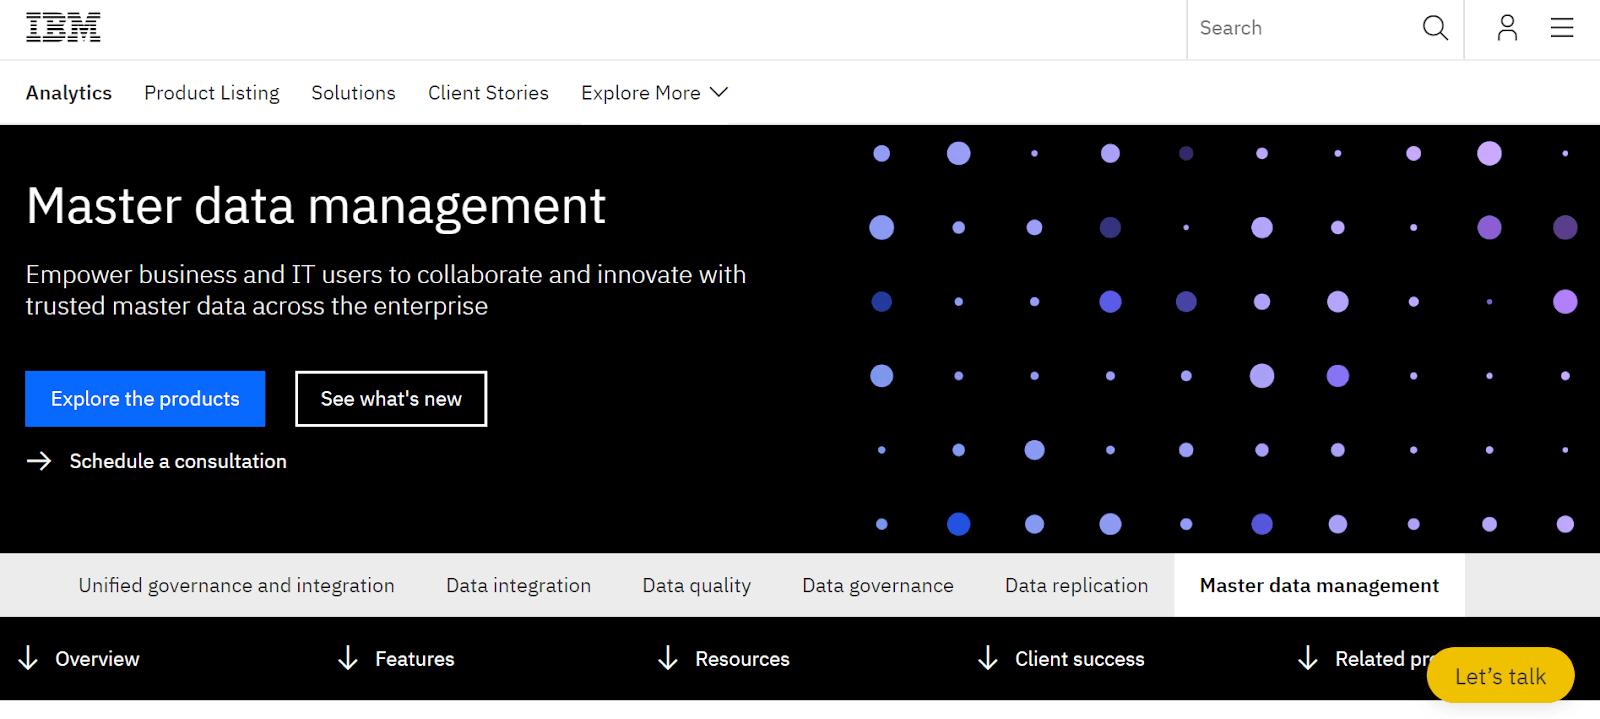 IBM Data Management Tool